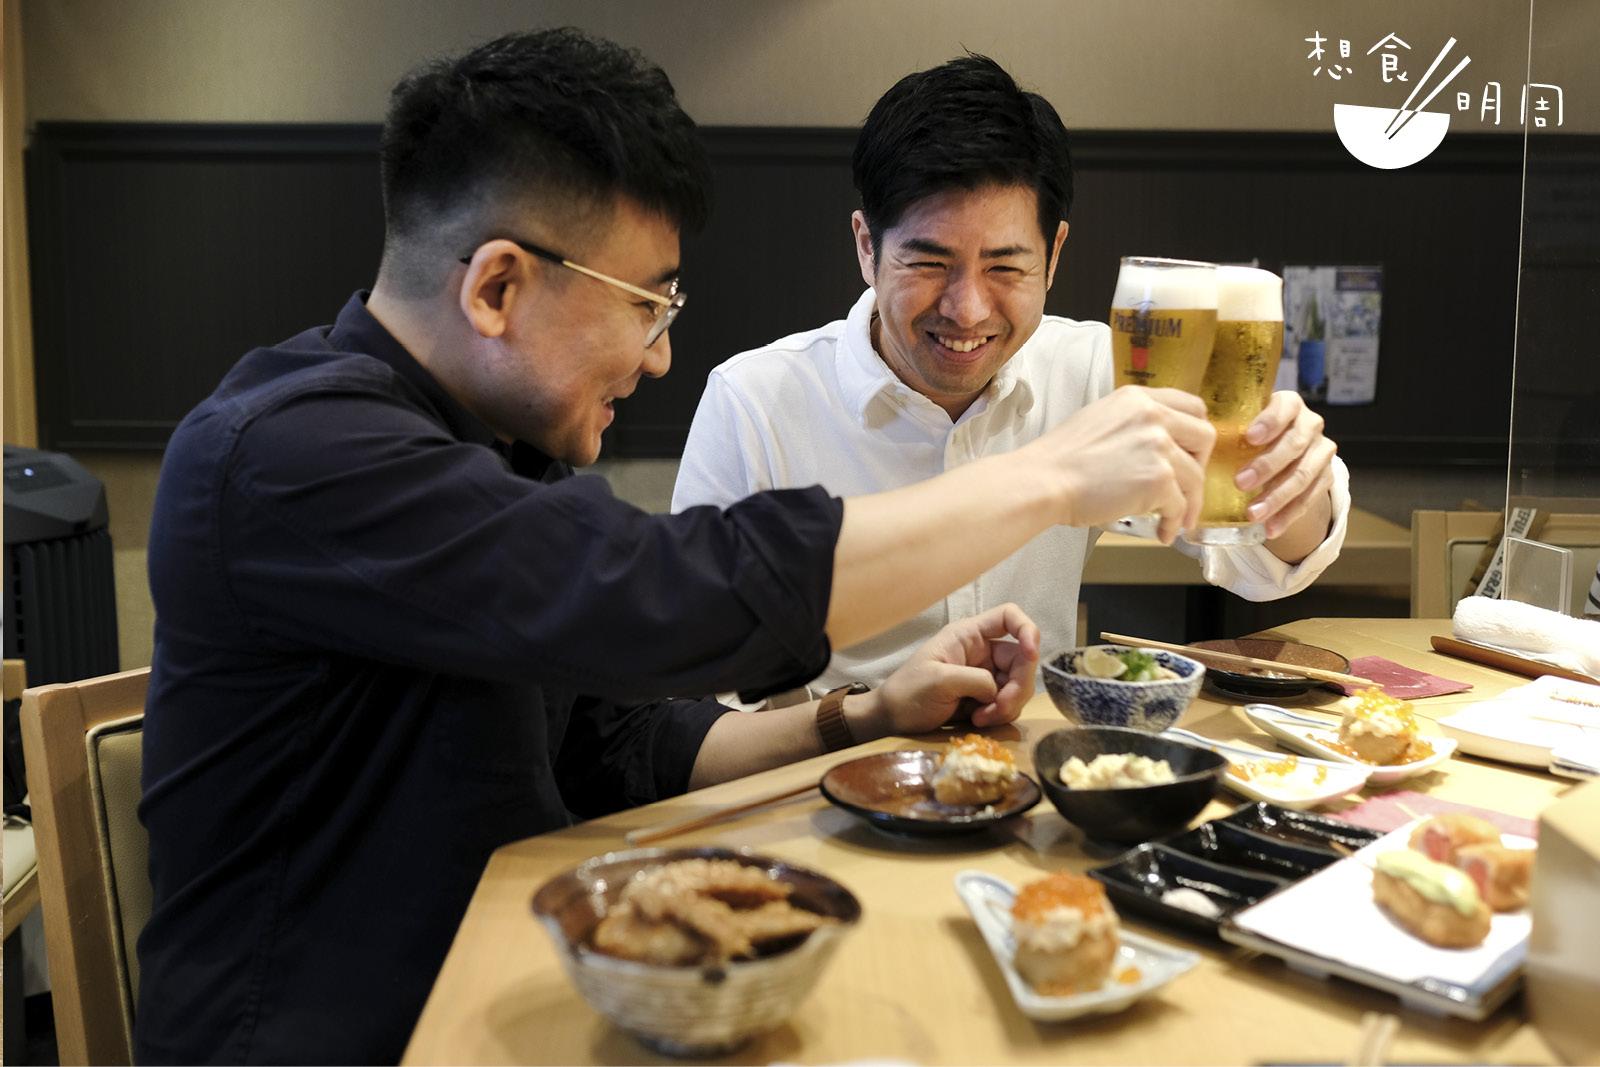 Kosei San(左)和Takeshi San (右)一致表示,居酒屋是日本人不可或缺的一部分!